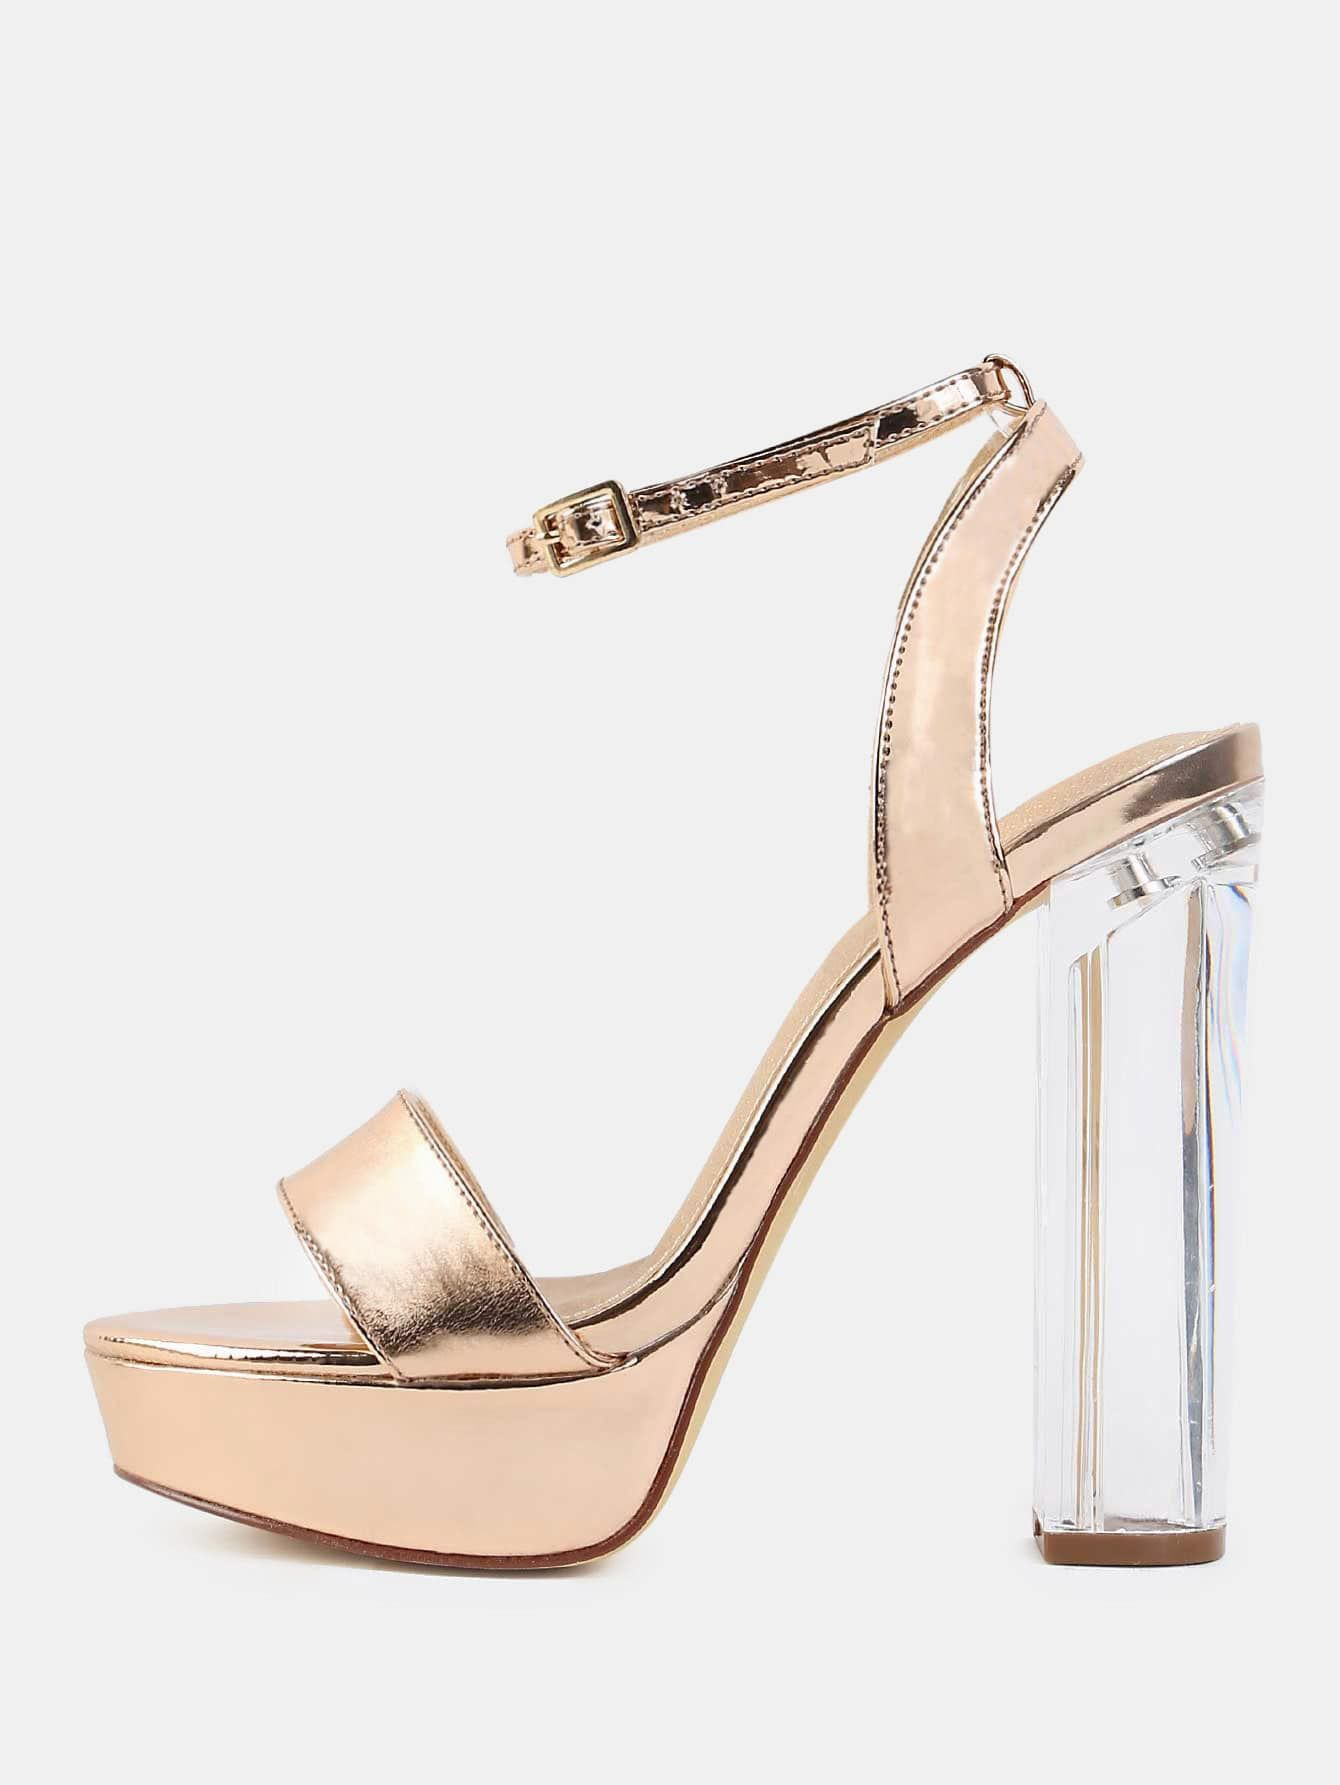 97352d87e99 Glamorous Peep Toe Platform Ankle strap Gold High Heel Chunky ...